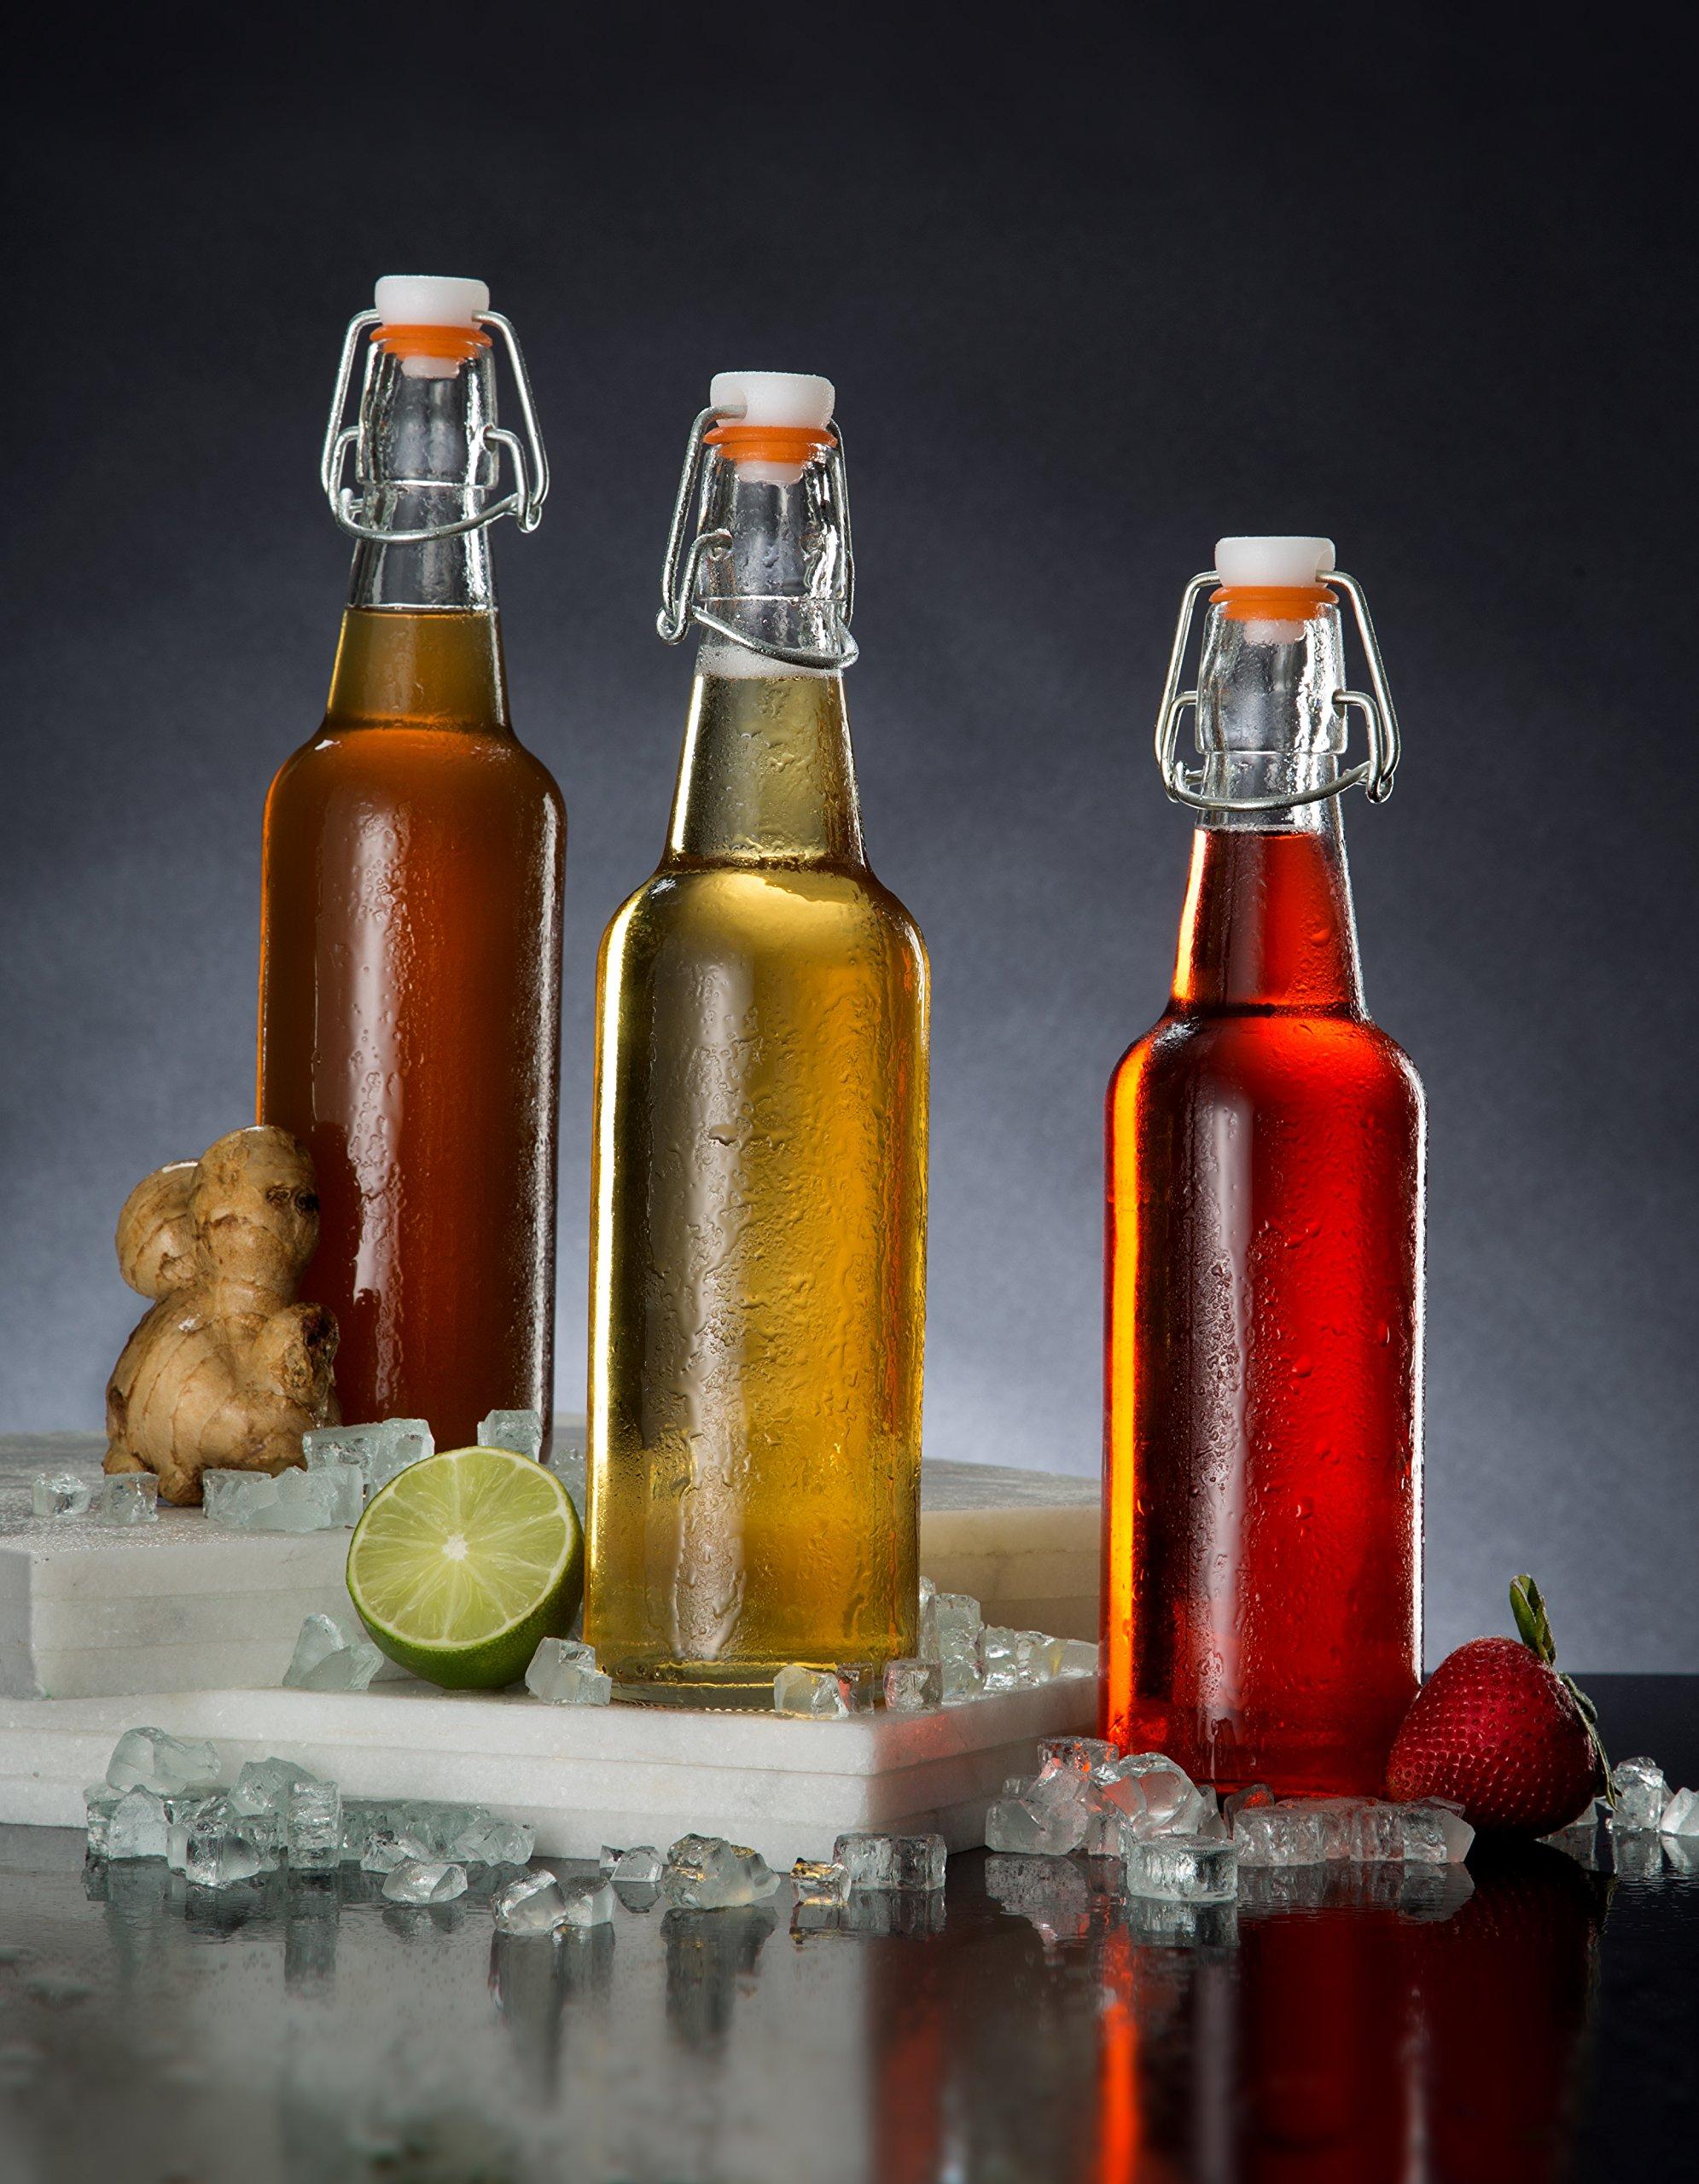 Zuzoro Glass Kombucha Bottles For Home Brewing Kombucha Kefir or Beer - 16 oz Clear Glass Grolsch Bottles case of 6 w/ Easy Swing top Cap w/ Gasket Seal Tight by Zuzuro (Image #6)